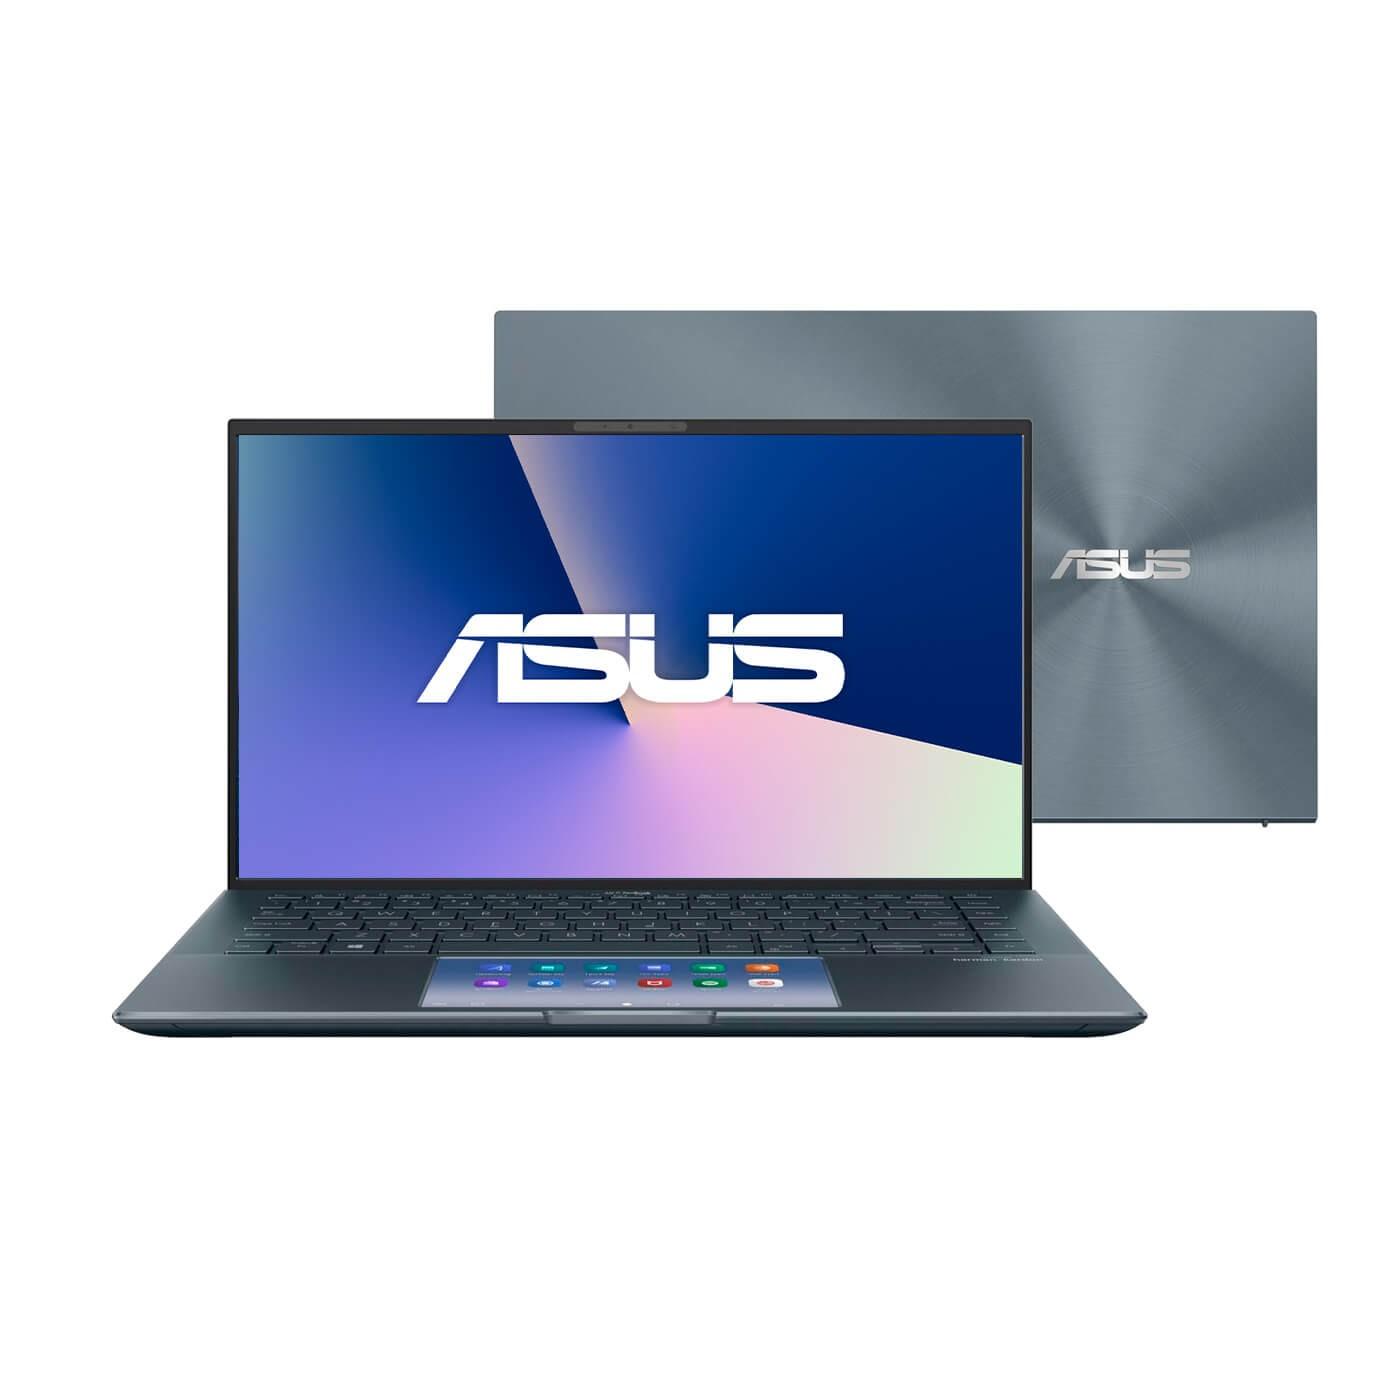 "🦂 ASUS ZENBOOK UX435EG ⚡  lNTEL CORE I7 1165G7 - RAM DDR4 16GB - SSD 512GB- 14"" FHD - VIDEO 2GB MX450 - WINDOWS 10 - TOUCH - procesadores-intel-core-i7, portatiles-con-graficadora, linea-hogar, equipos-para-estudiantes, equipos-gamers, computadores-portatiles, computadores-con-graficadora, asys-computadores-asyscom - 4718017950893 001"